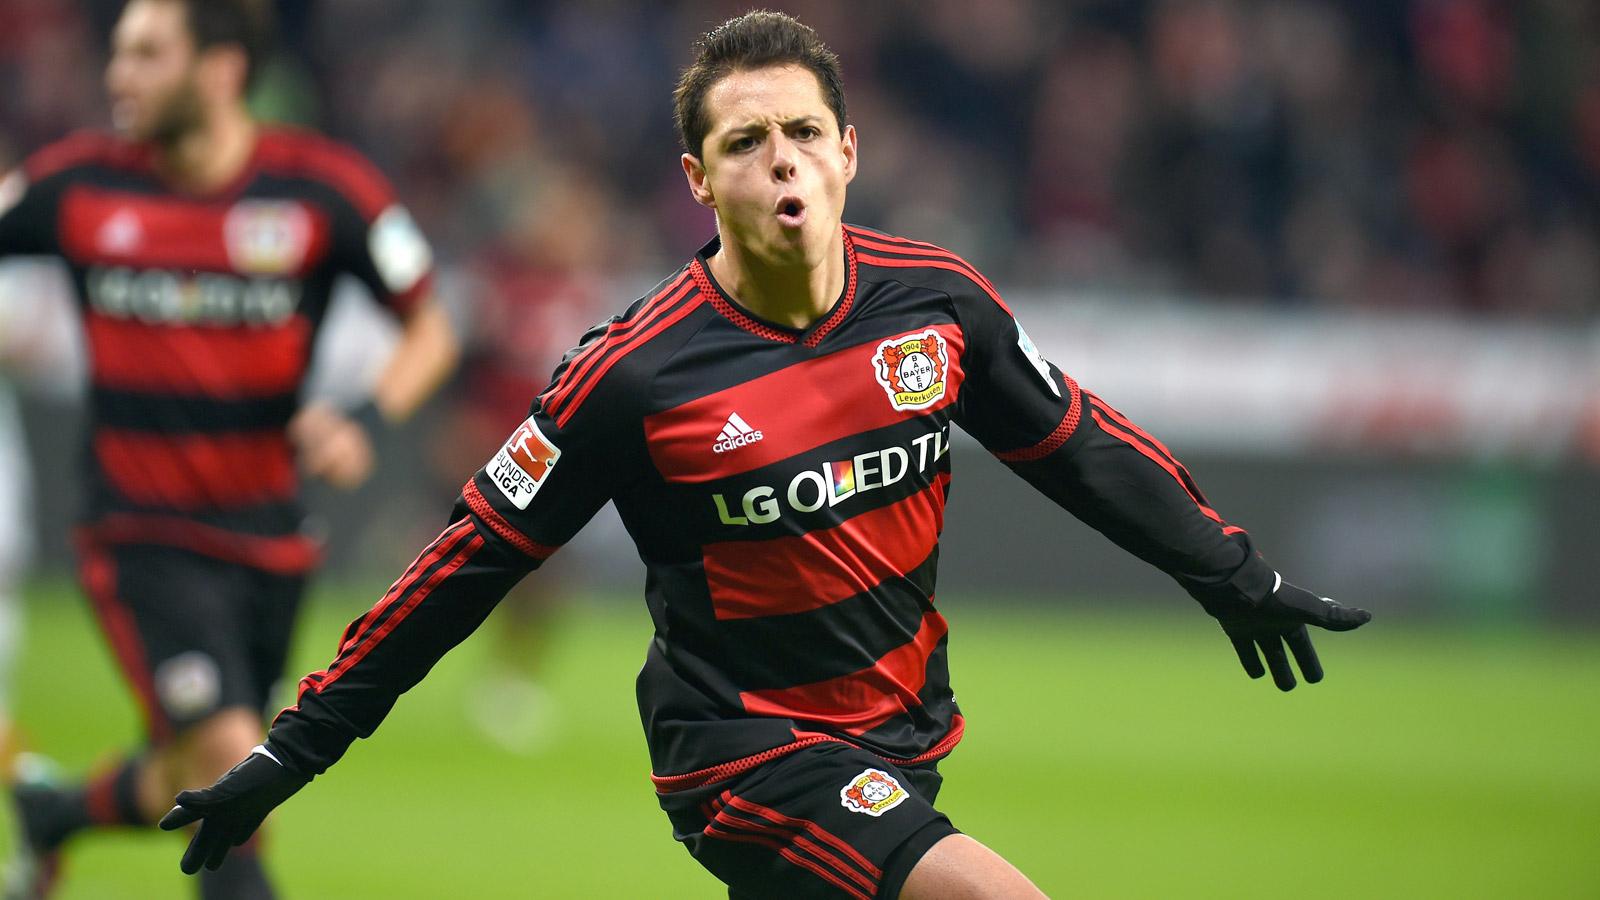 Arsenal target shock move for Leverkusen star Chicharito